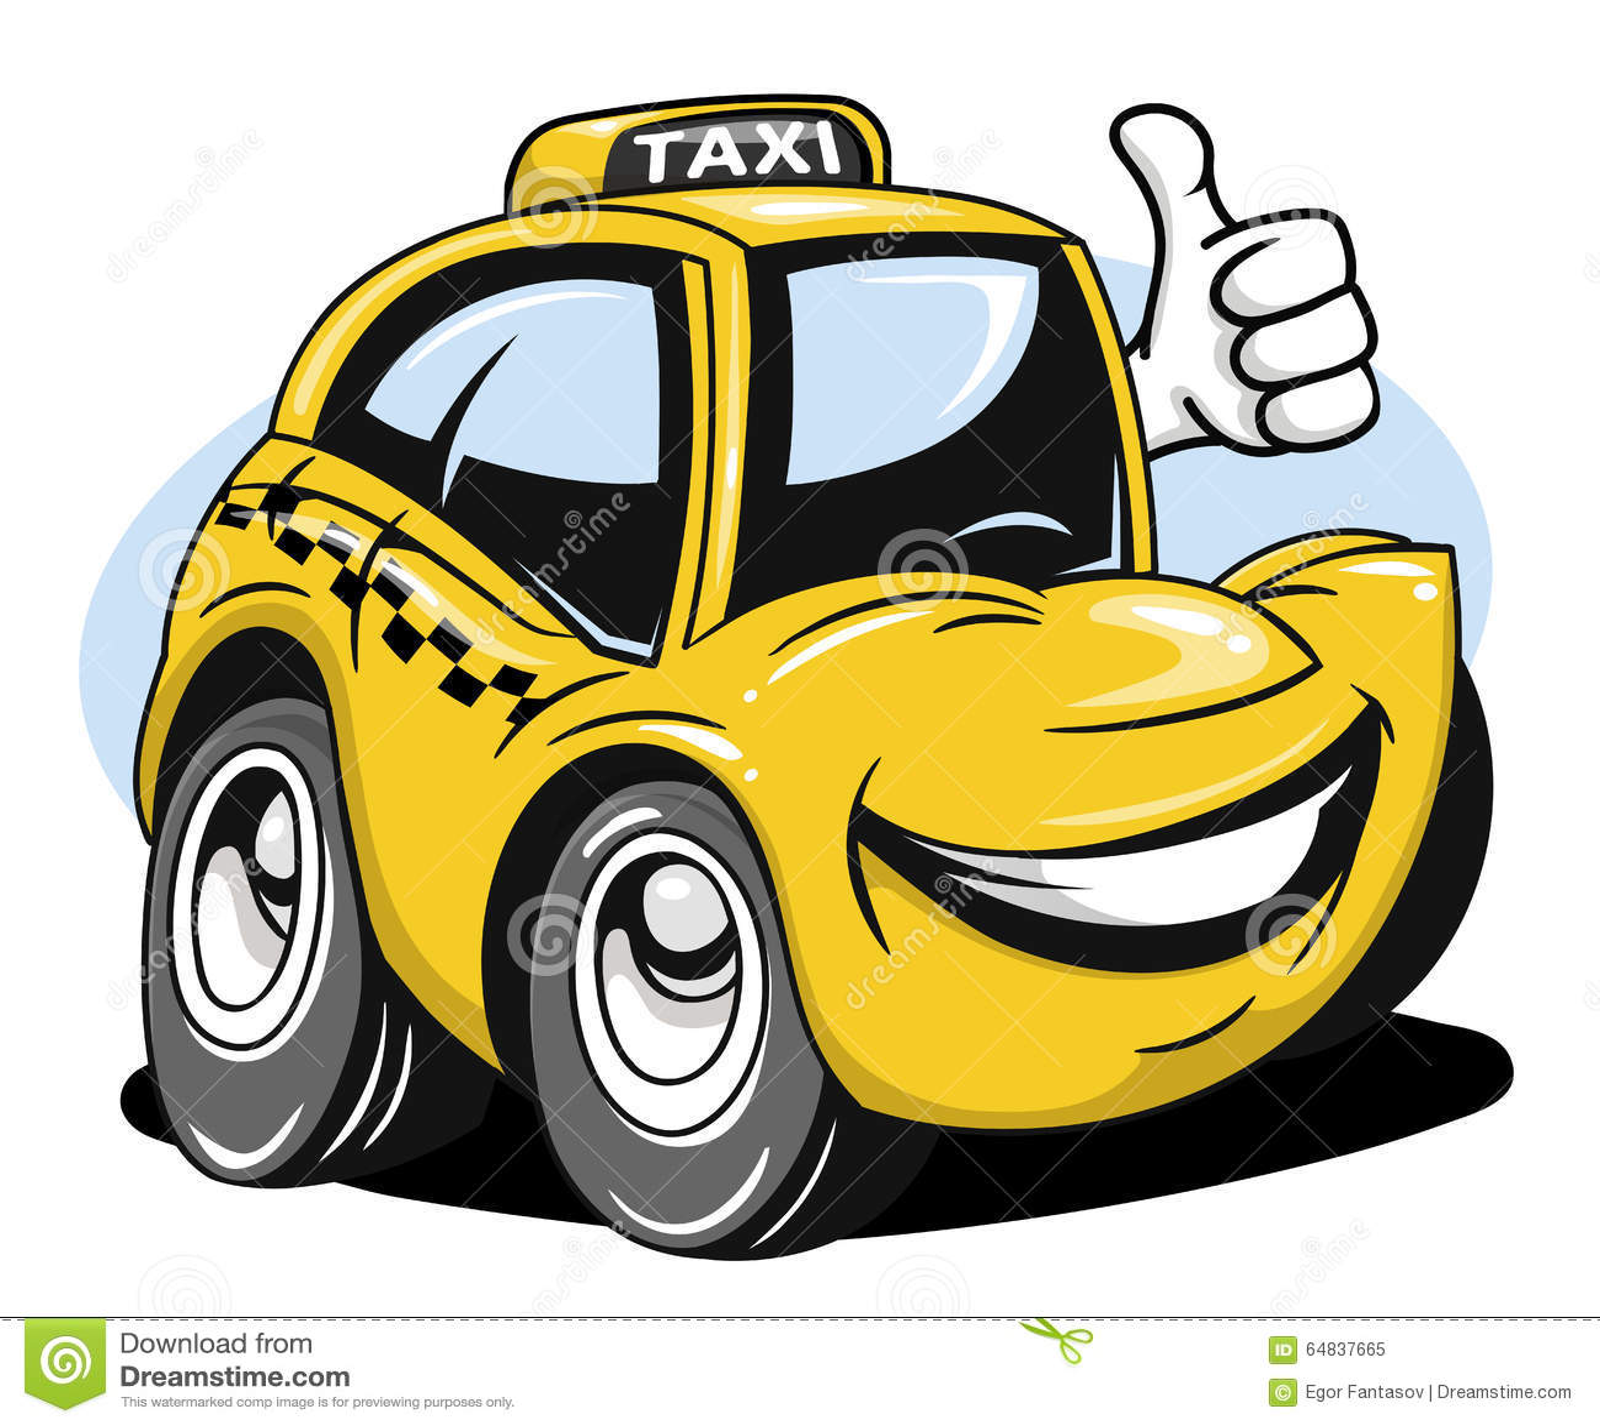 Taxi Car Old Cartoon